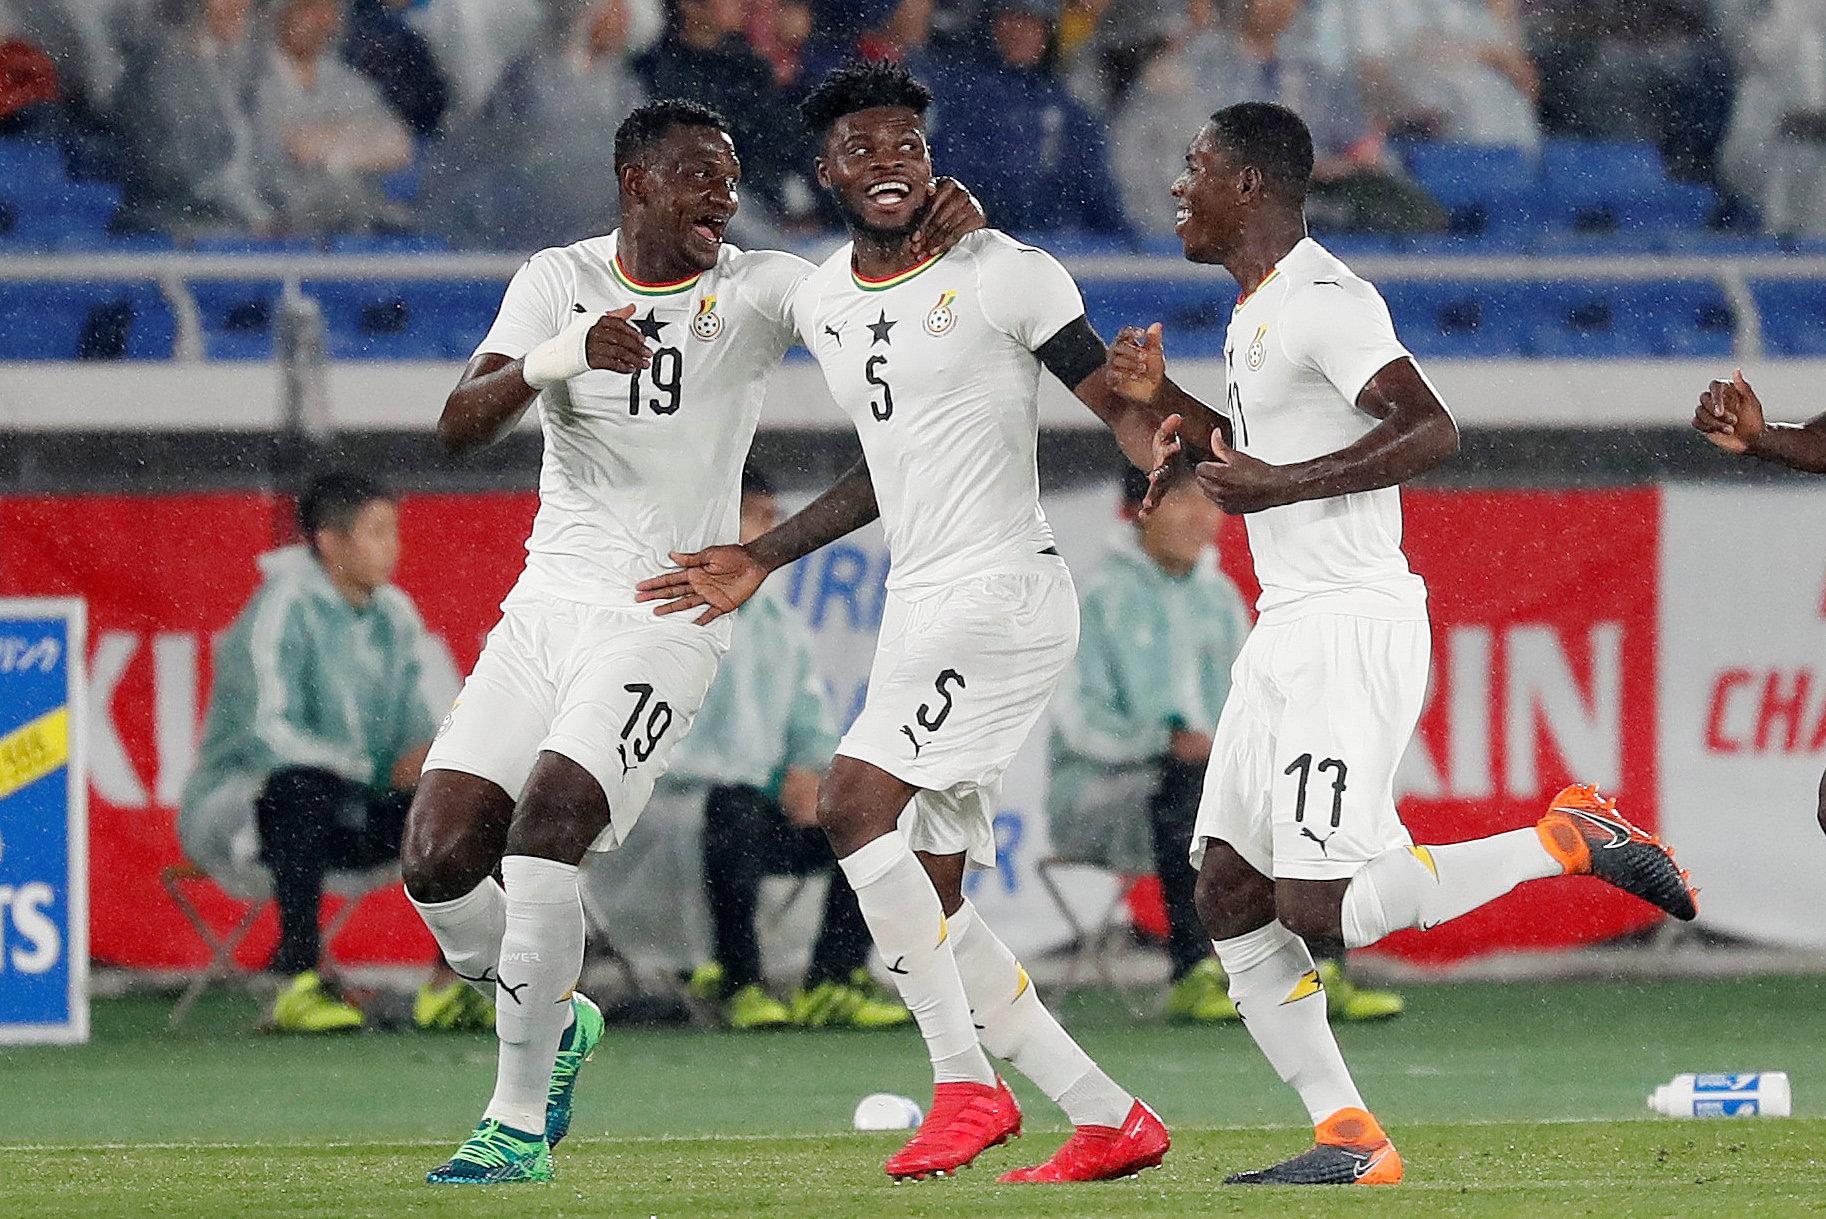 Thomas Partey is the future captain of Black Stars – Essien